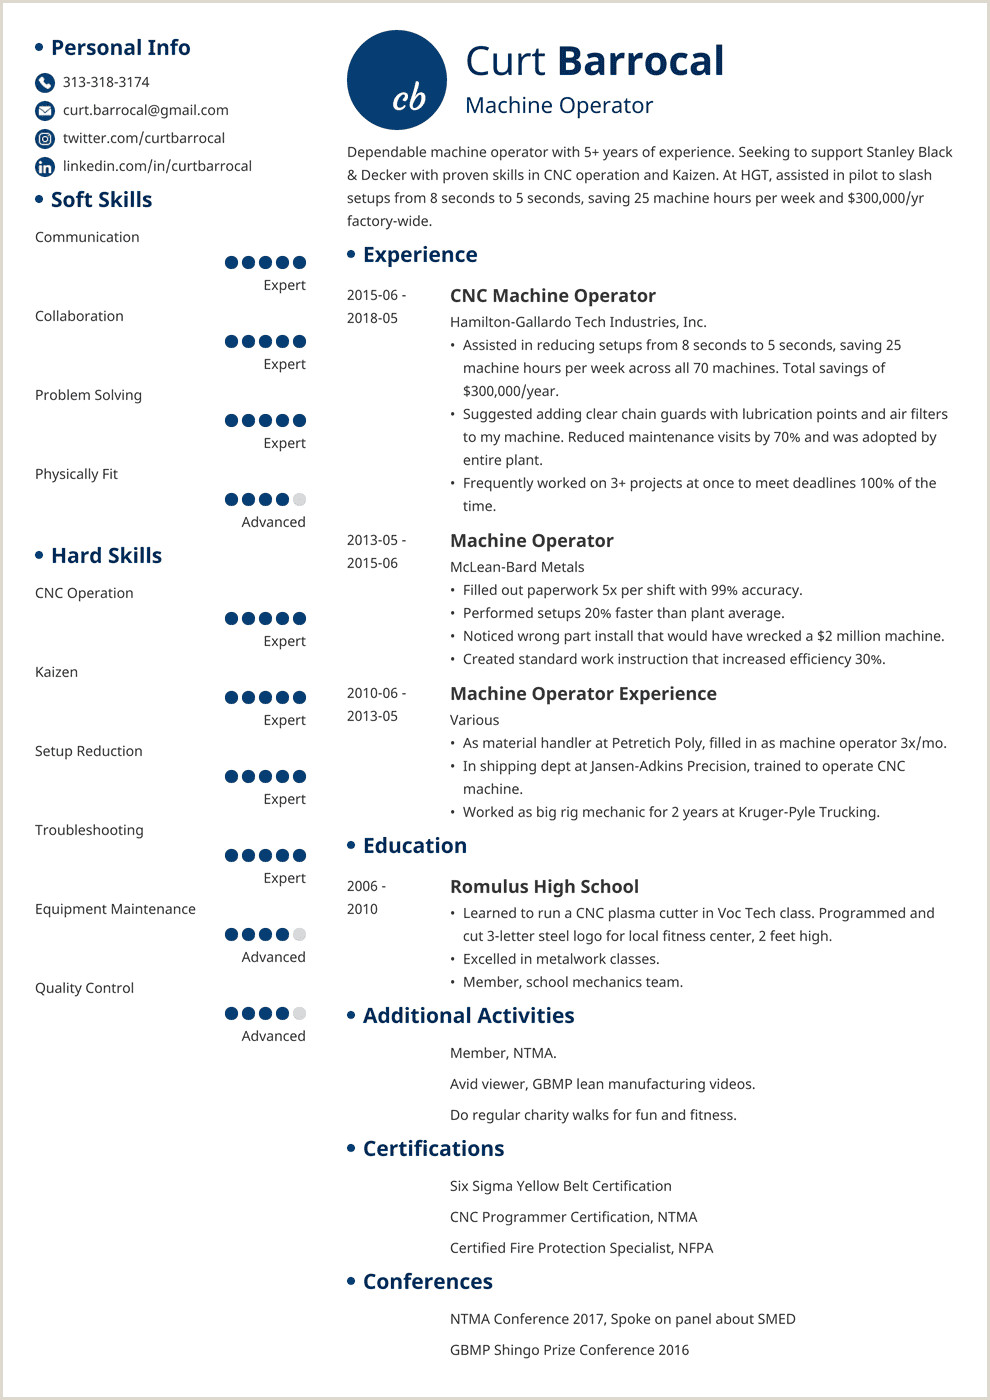 Machine Operator Resume Samples and Writing Guide [20